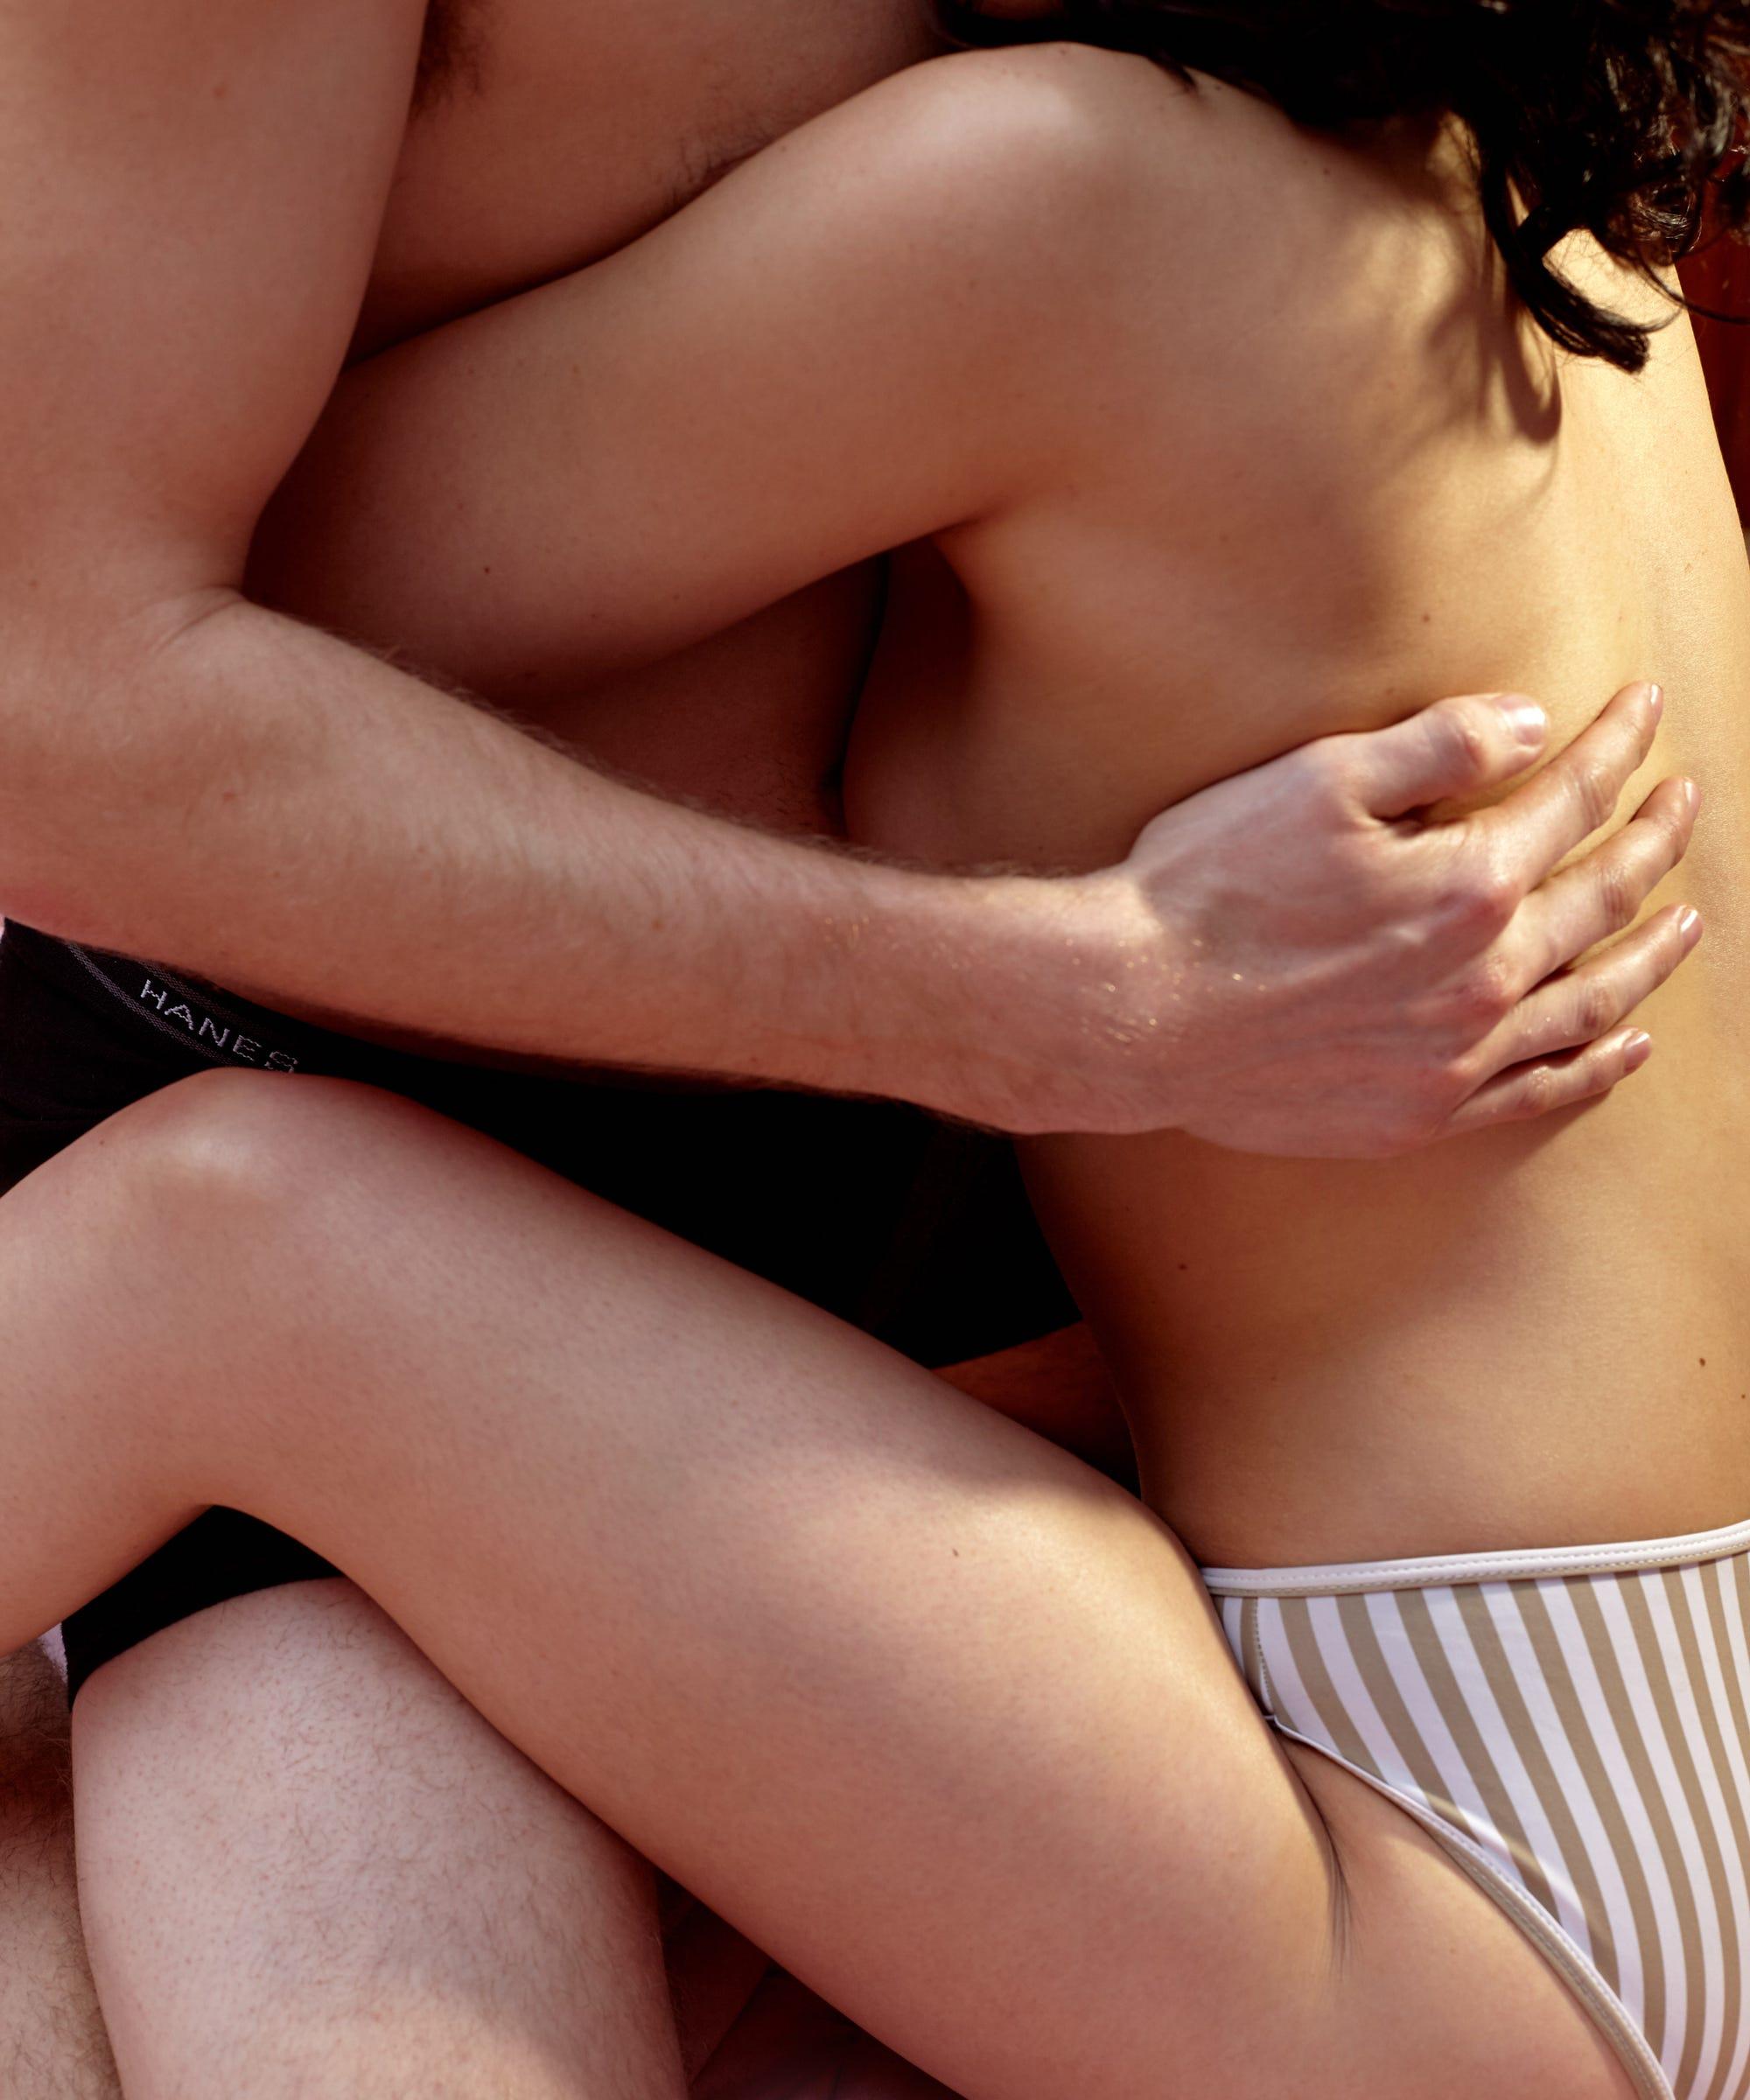 Family guy porn gif